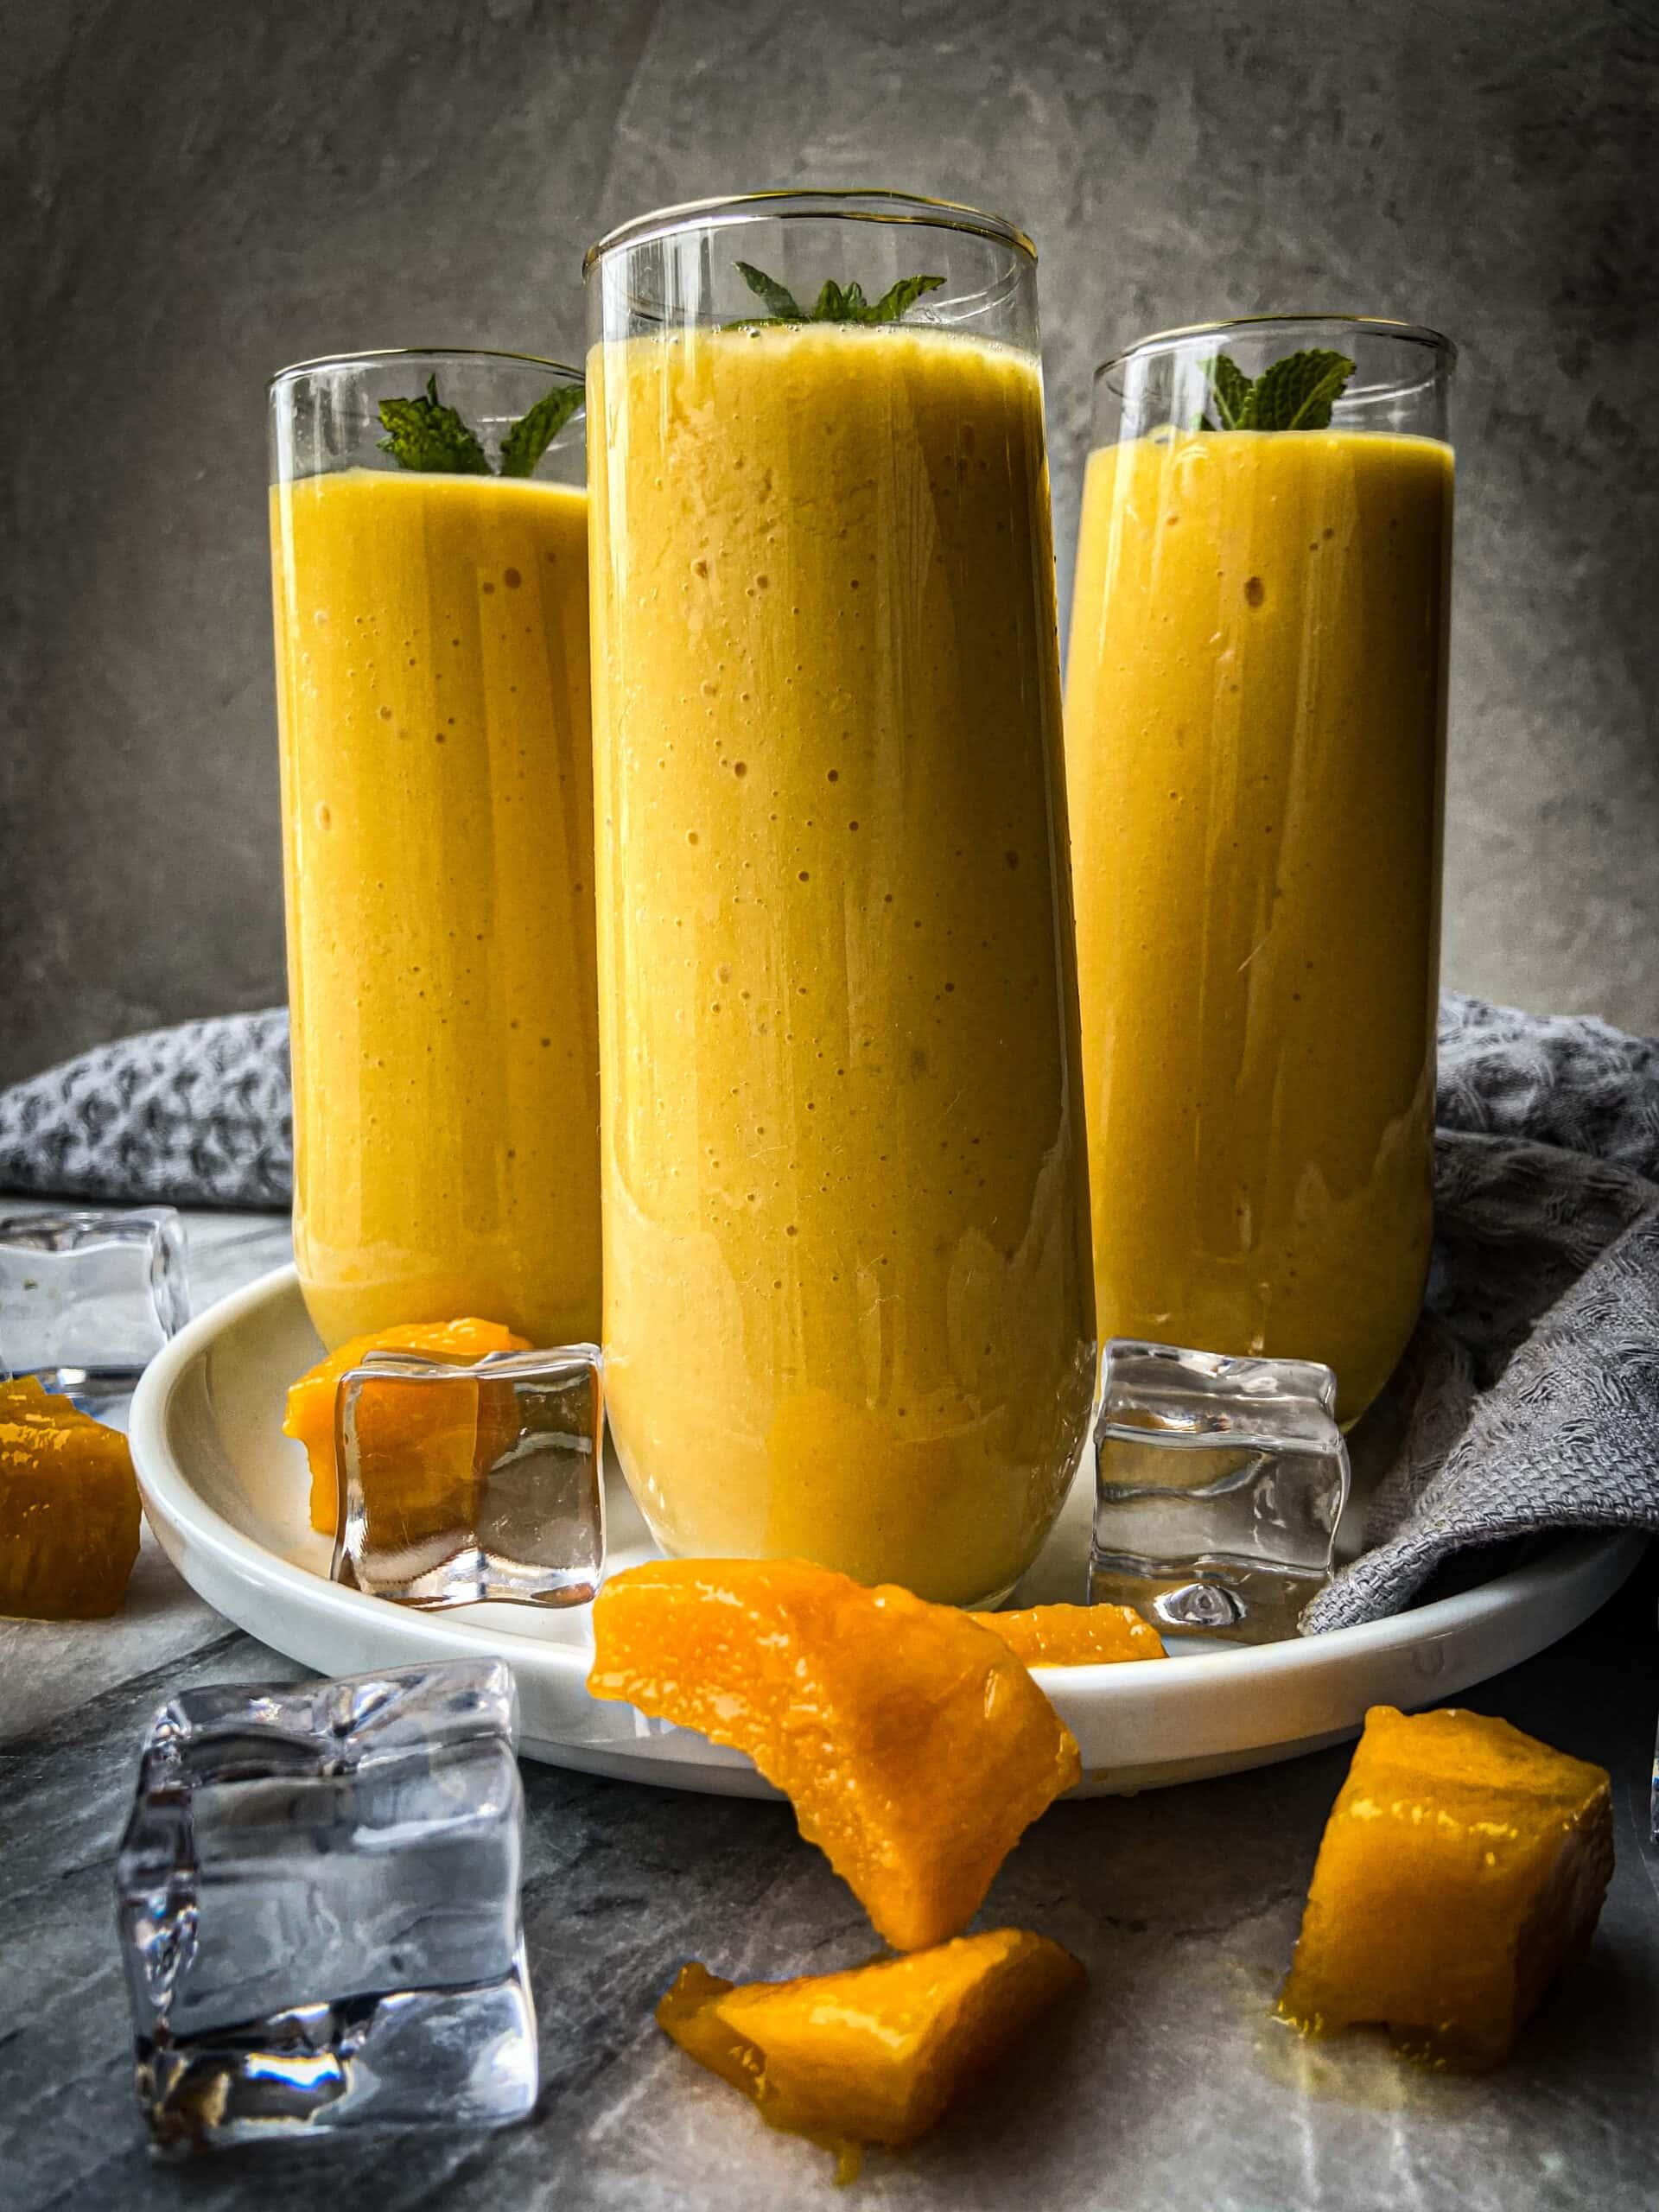 3 tall glasses of mango lassi